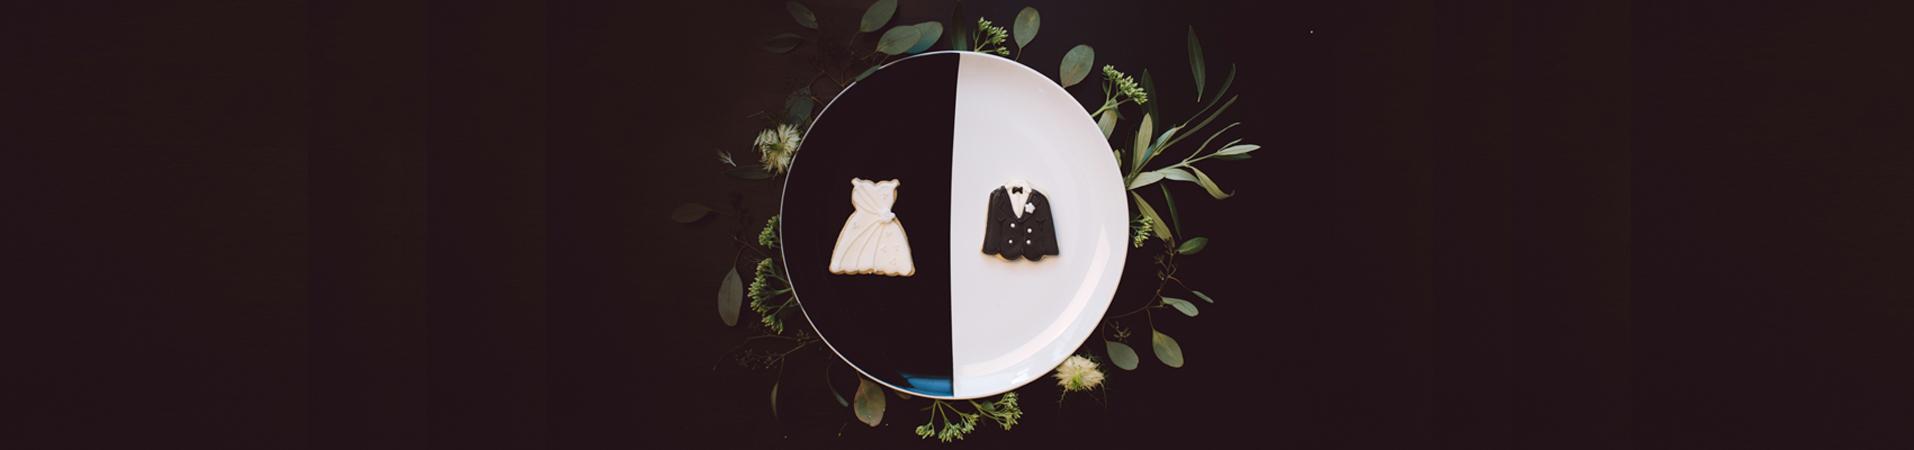 wedding_planner_treviso_padova_venezia